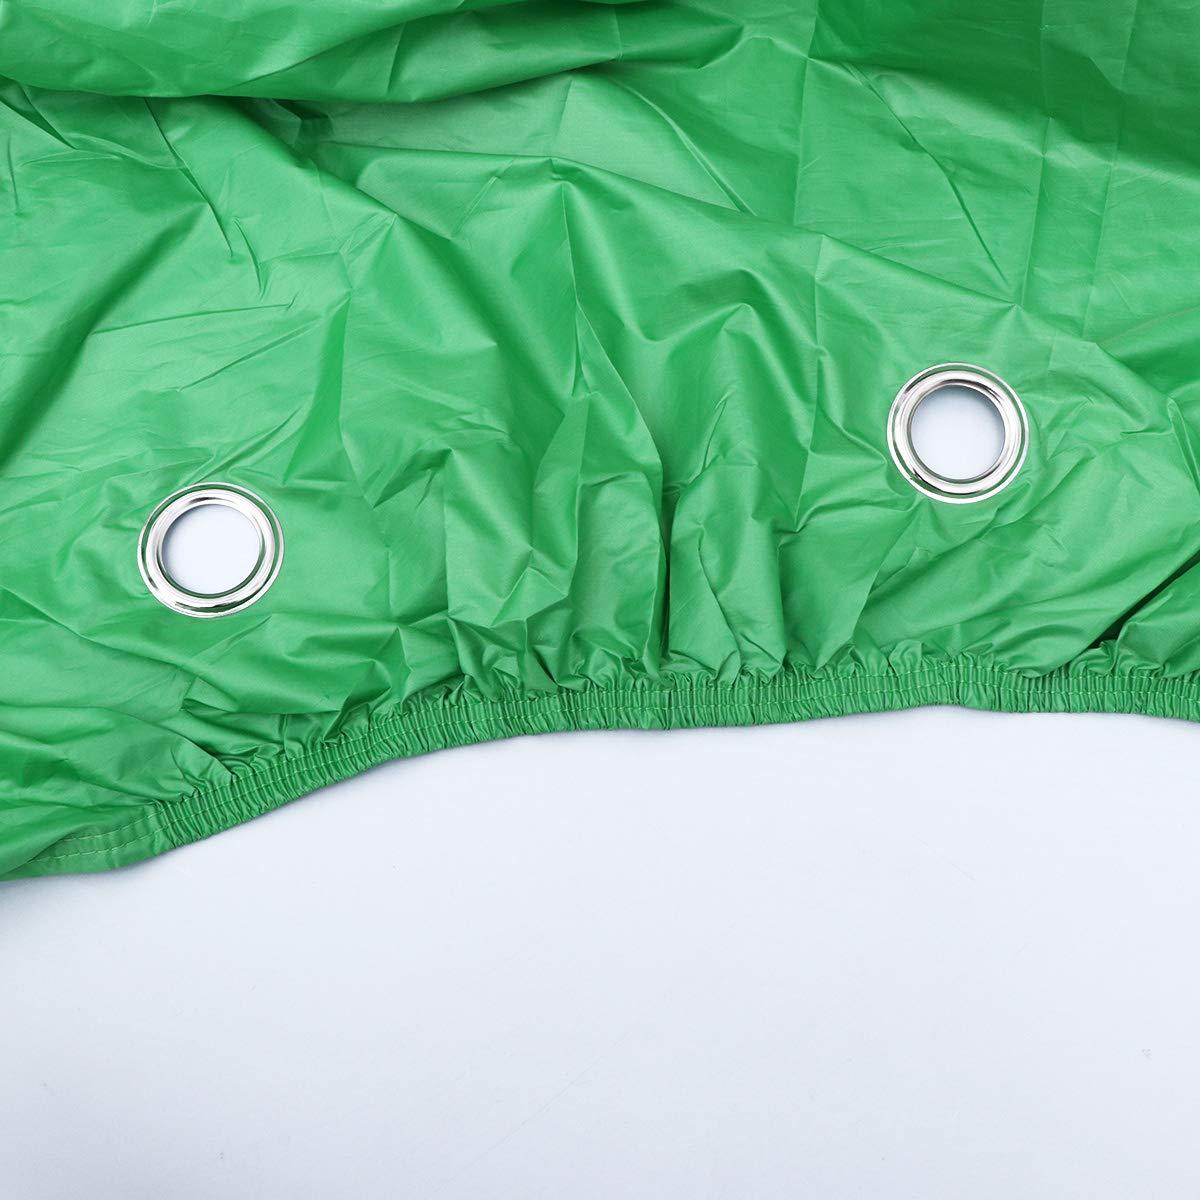 Fandhyy Bagno Tenda da Doccia Tessuto in Poliestere Natale Cartoon Cat Stampa Tenda da Bagno per Arredo Bagno Lavabile 120X180Cm A